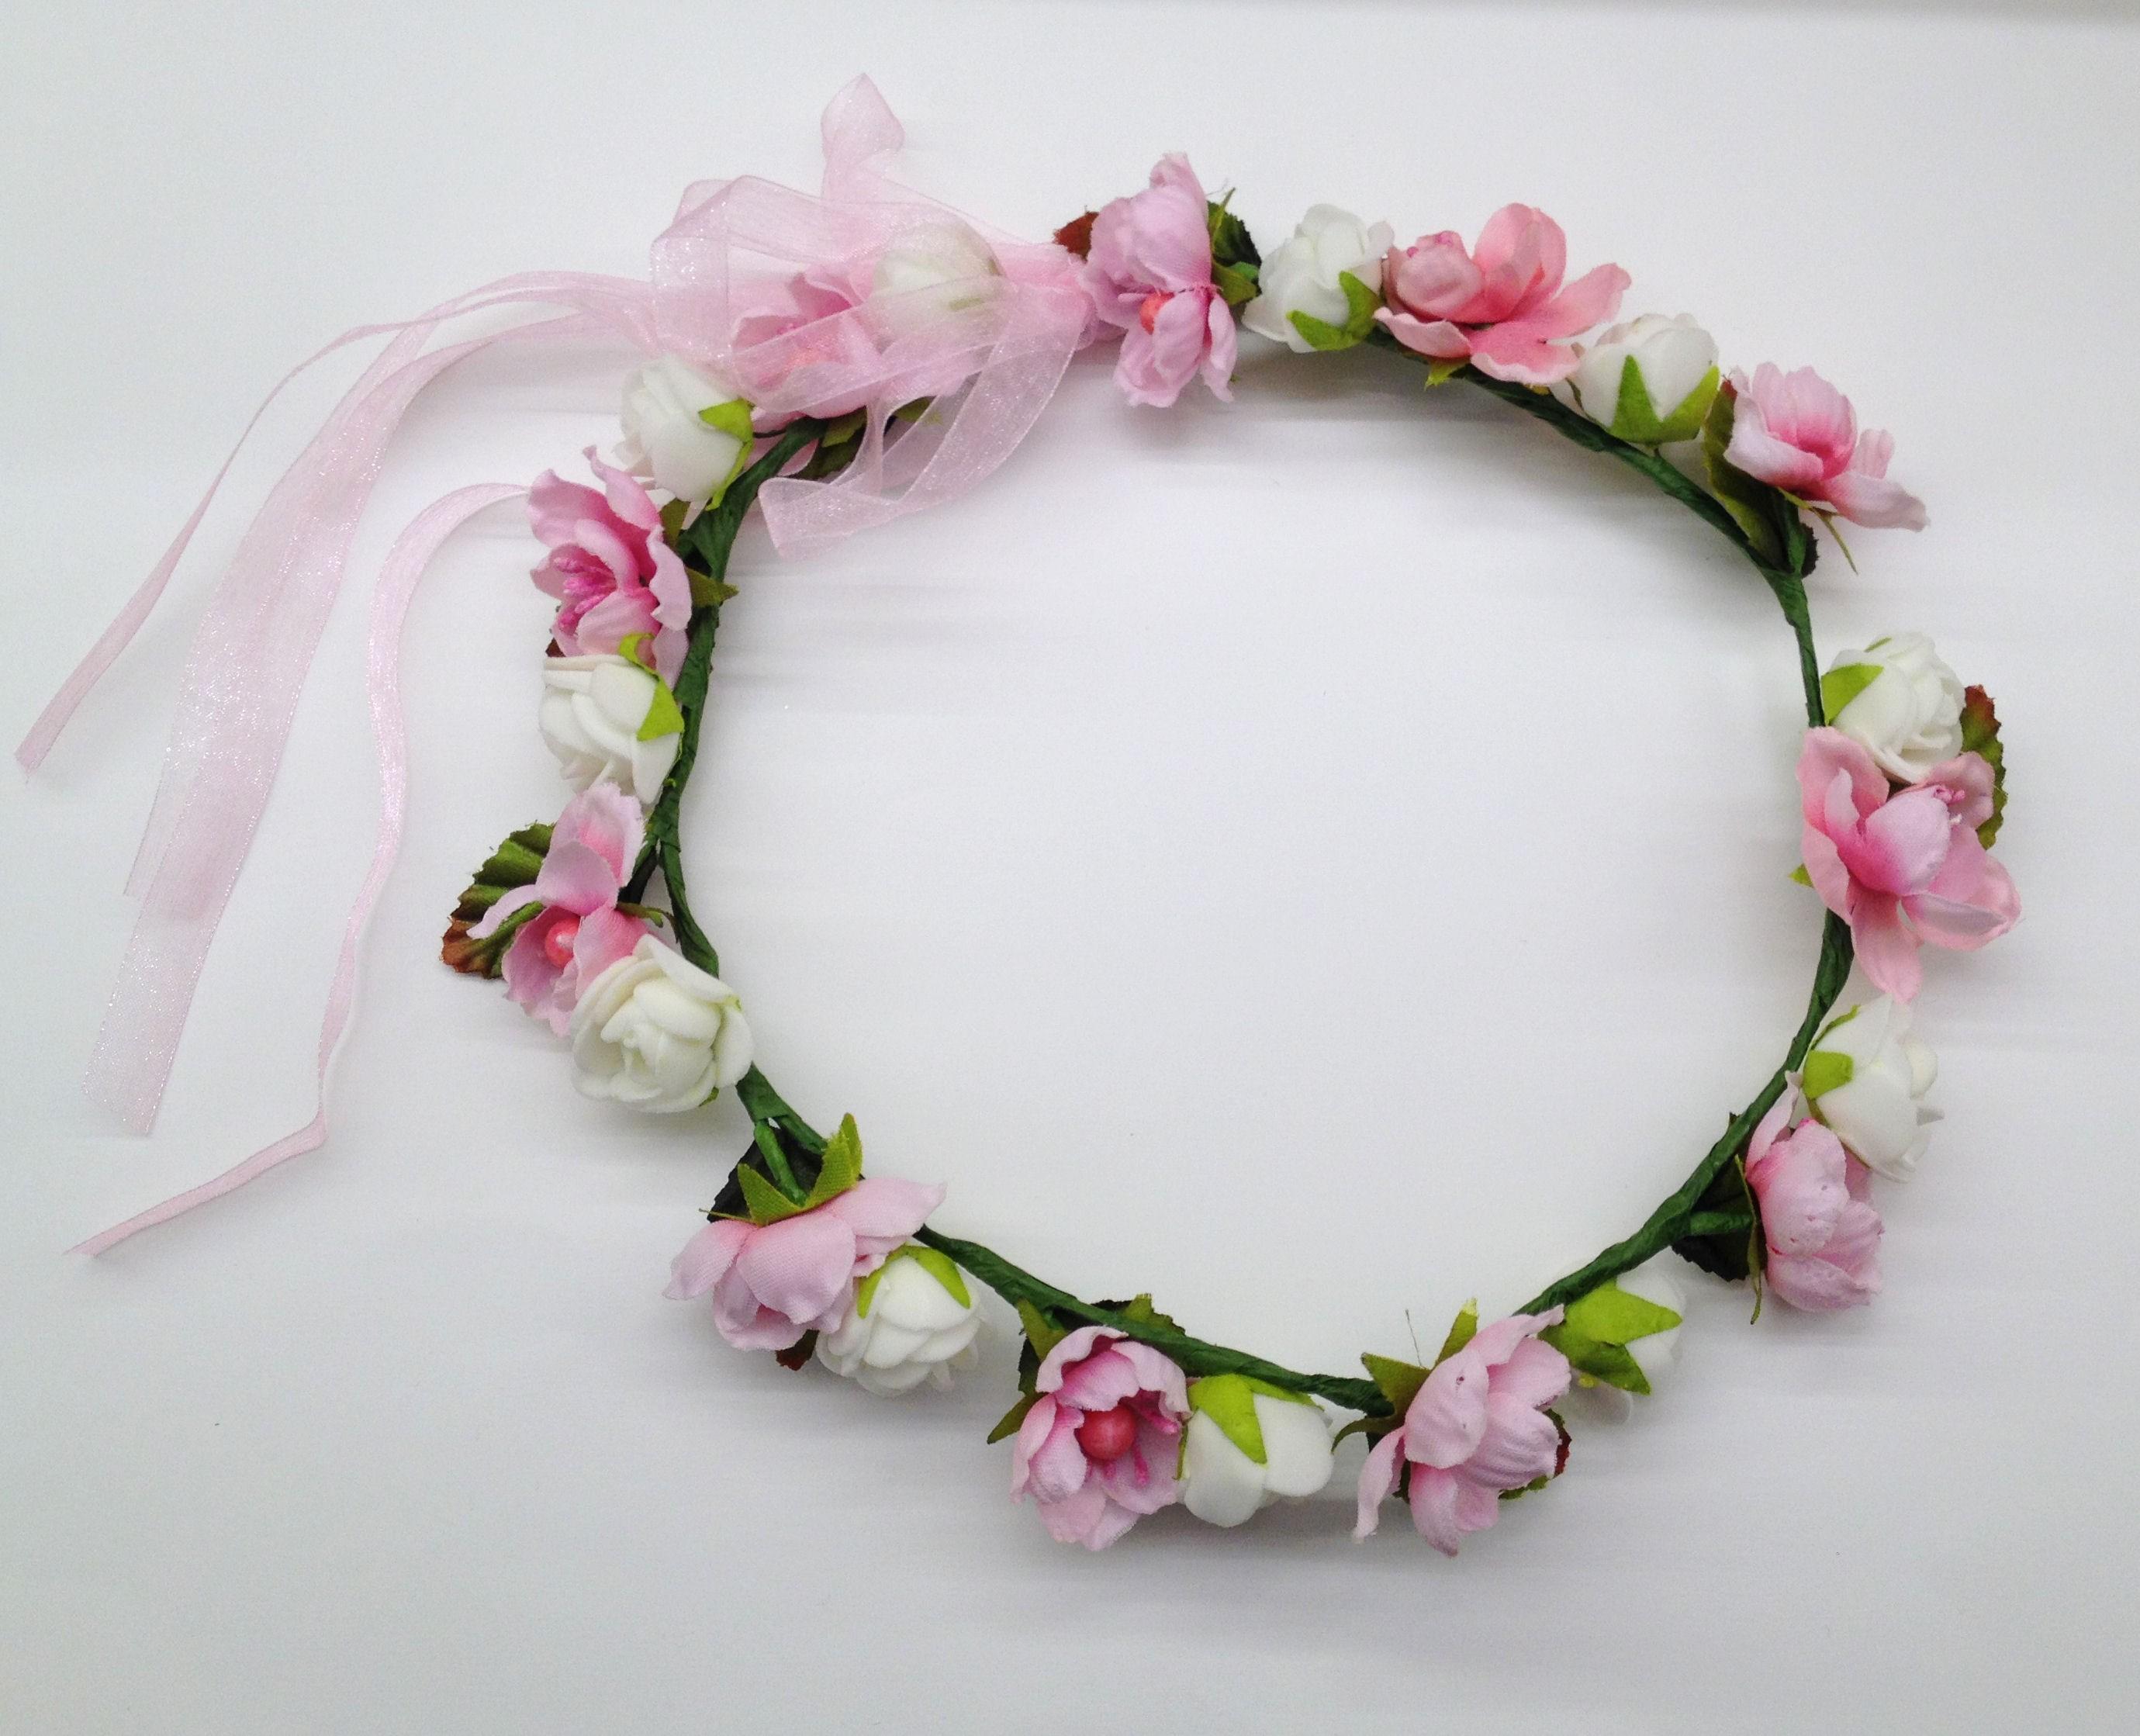 Coroncina fiorita